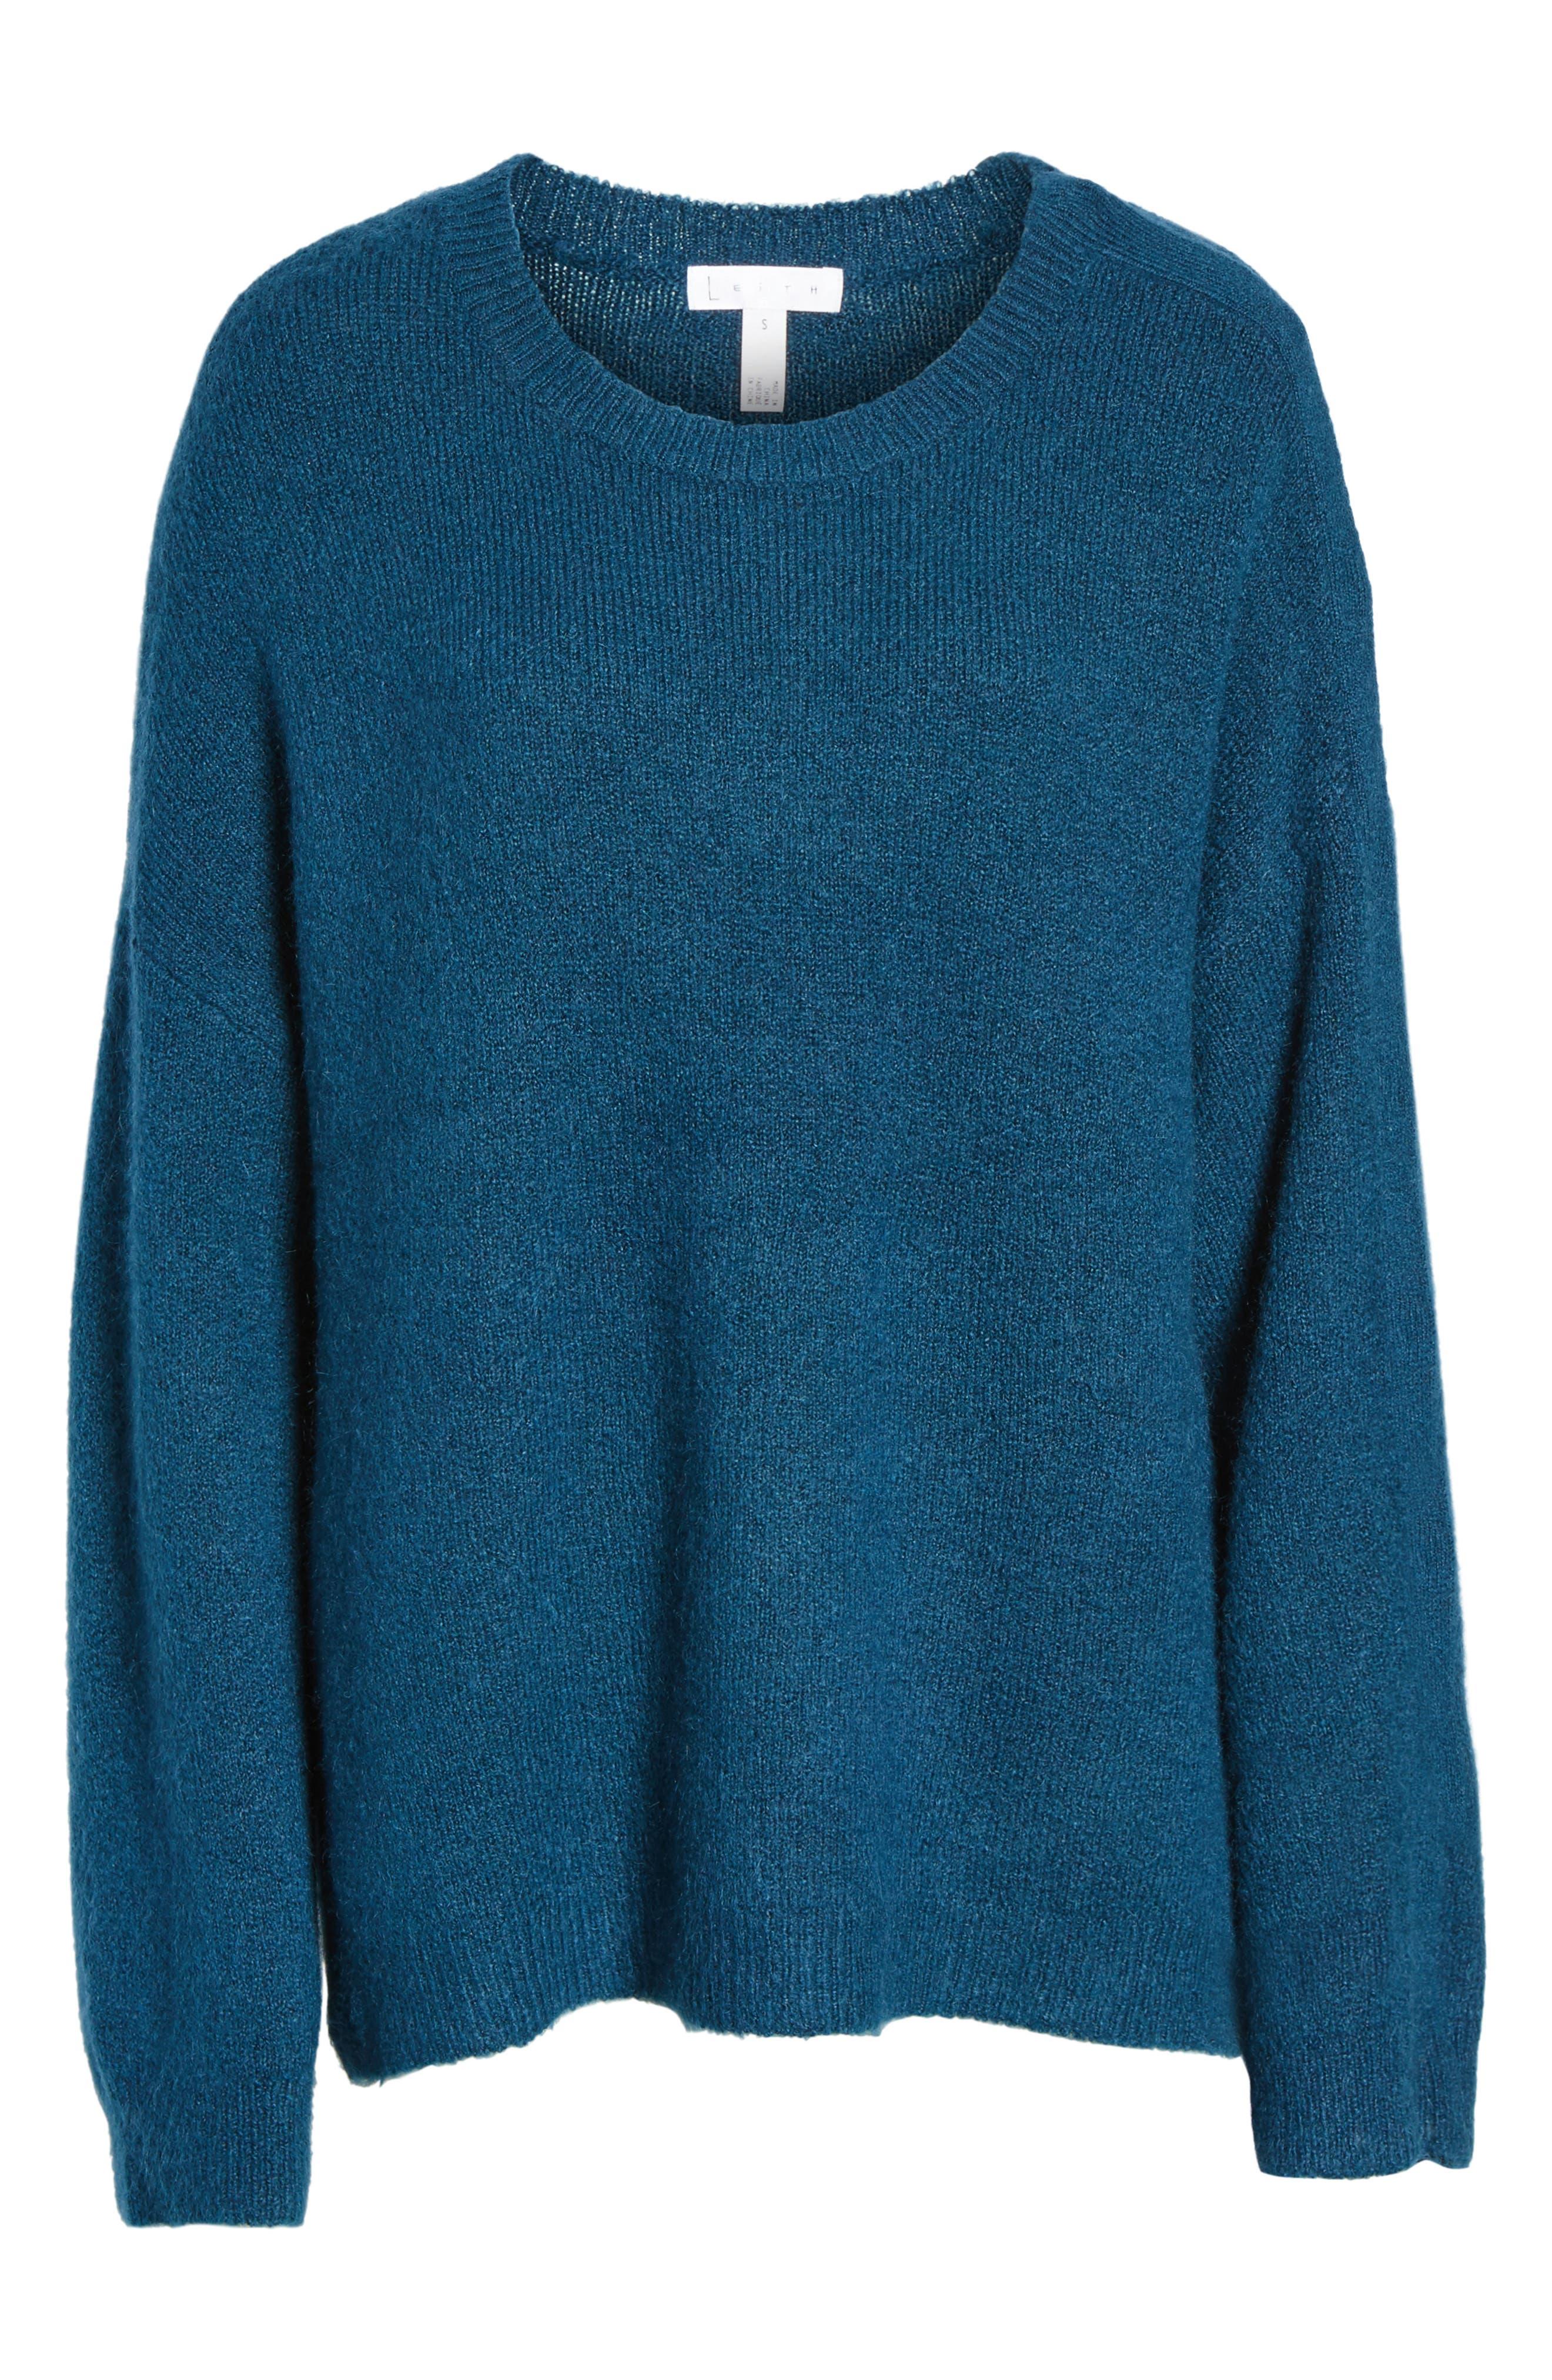 Snap Shoulder Sweater,                             Alternate thumbnail 5, color,                             Blue Ceramic